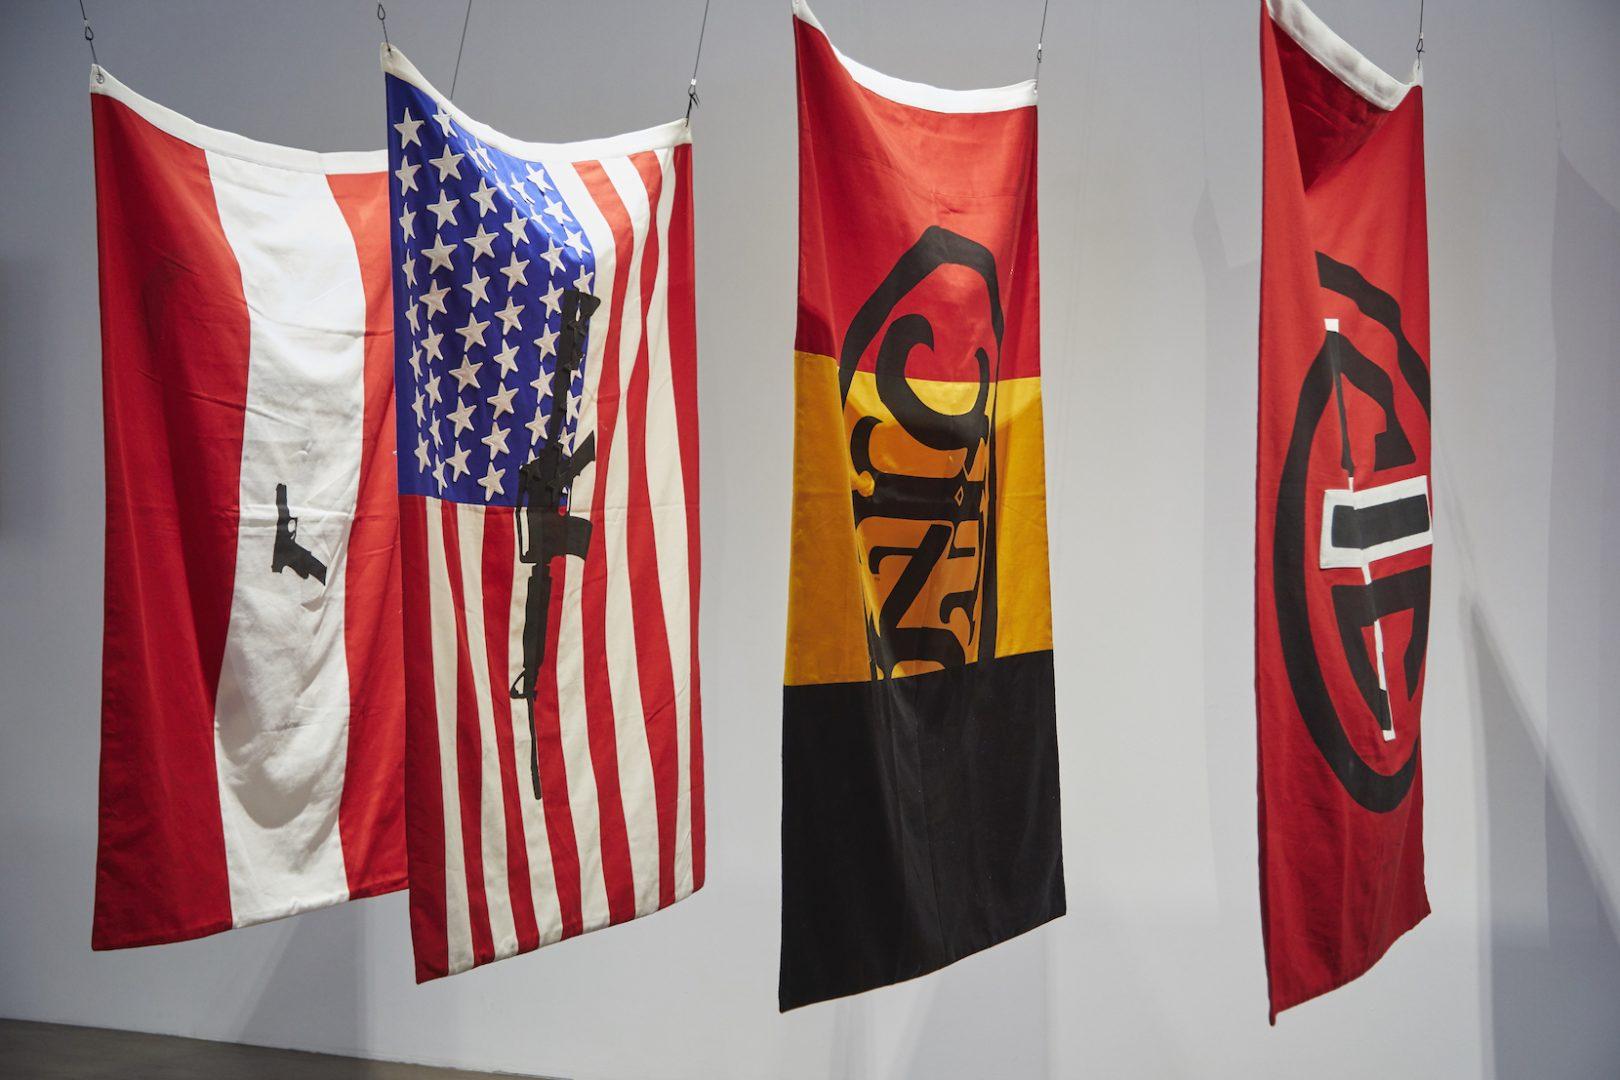 Igor Vidor, Against Again: Art under attack in Brazil , 2020, Shiva Gallery, New York